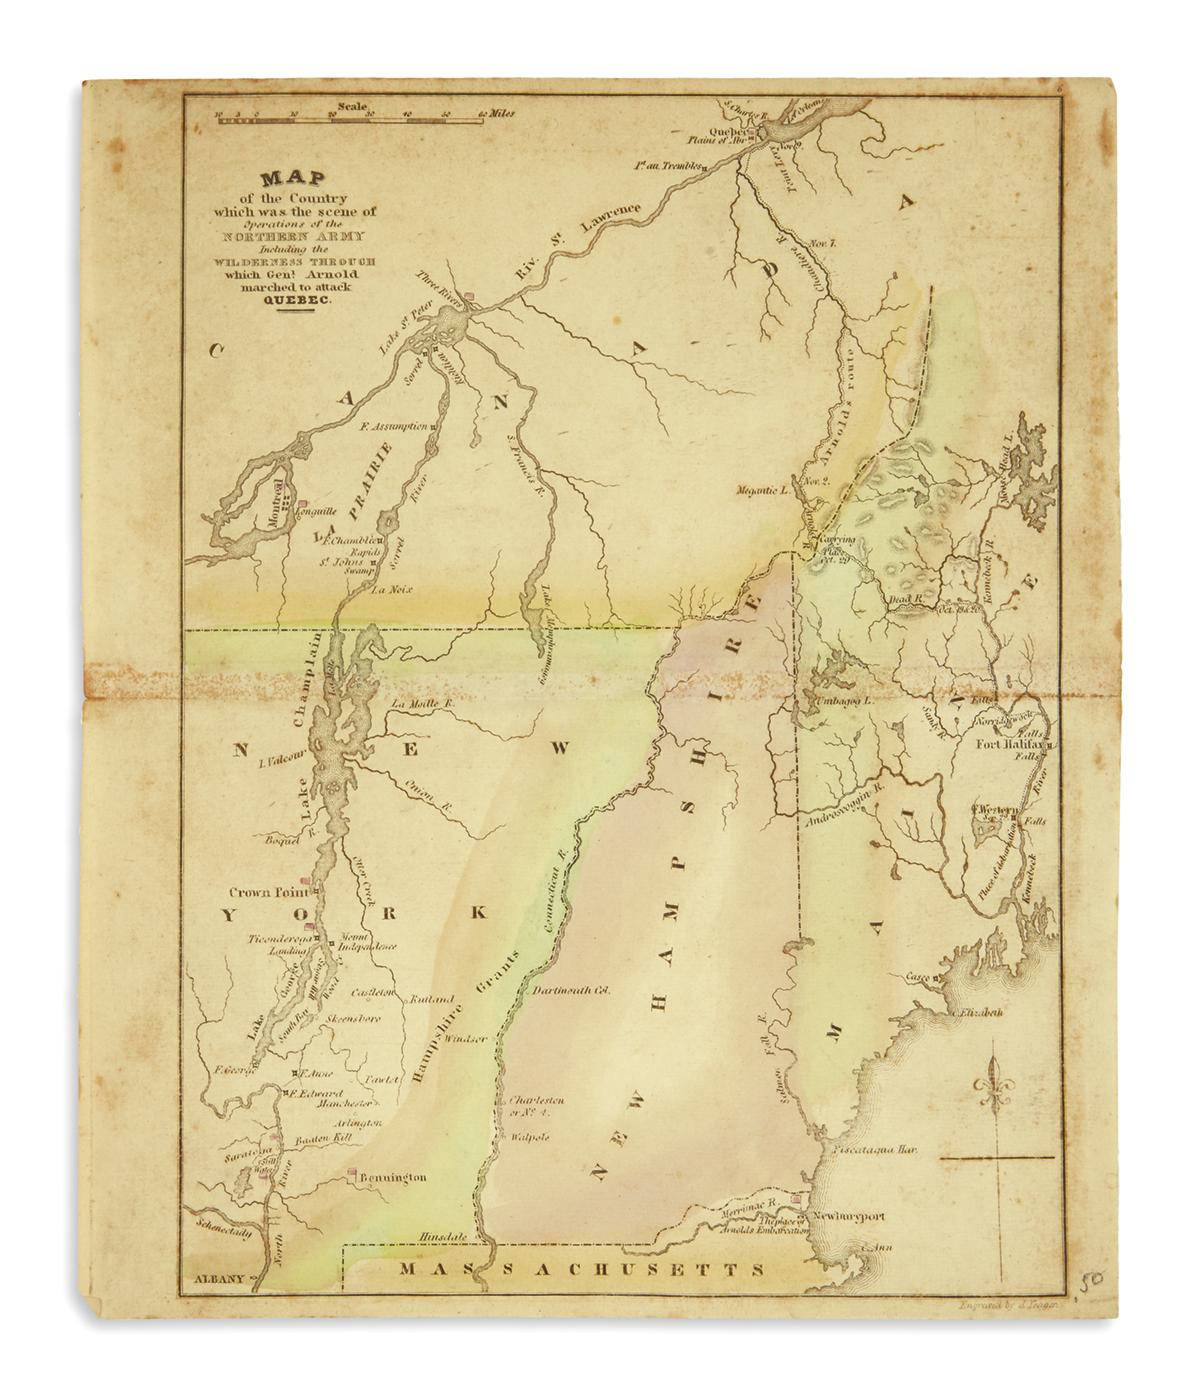 (MAINE)-Group-of-manuscripts-and-ephemera-relating-to-Maine